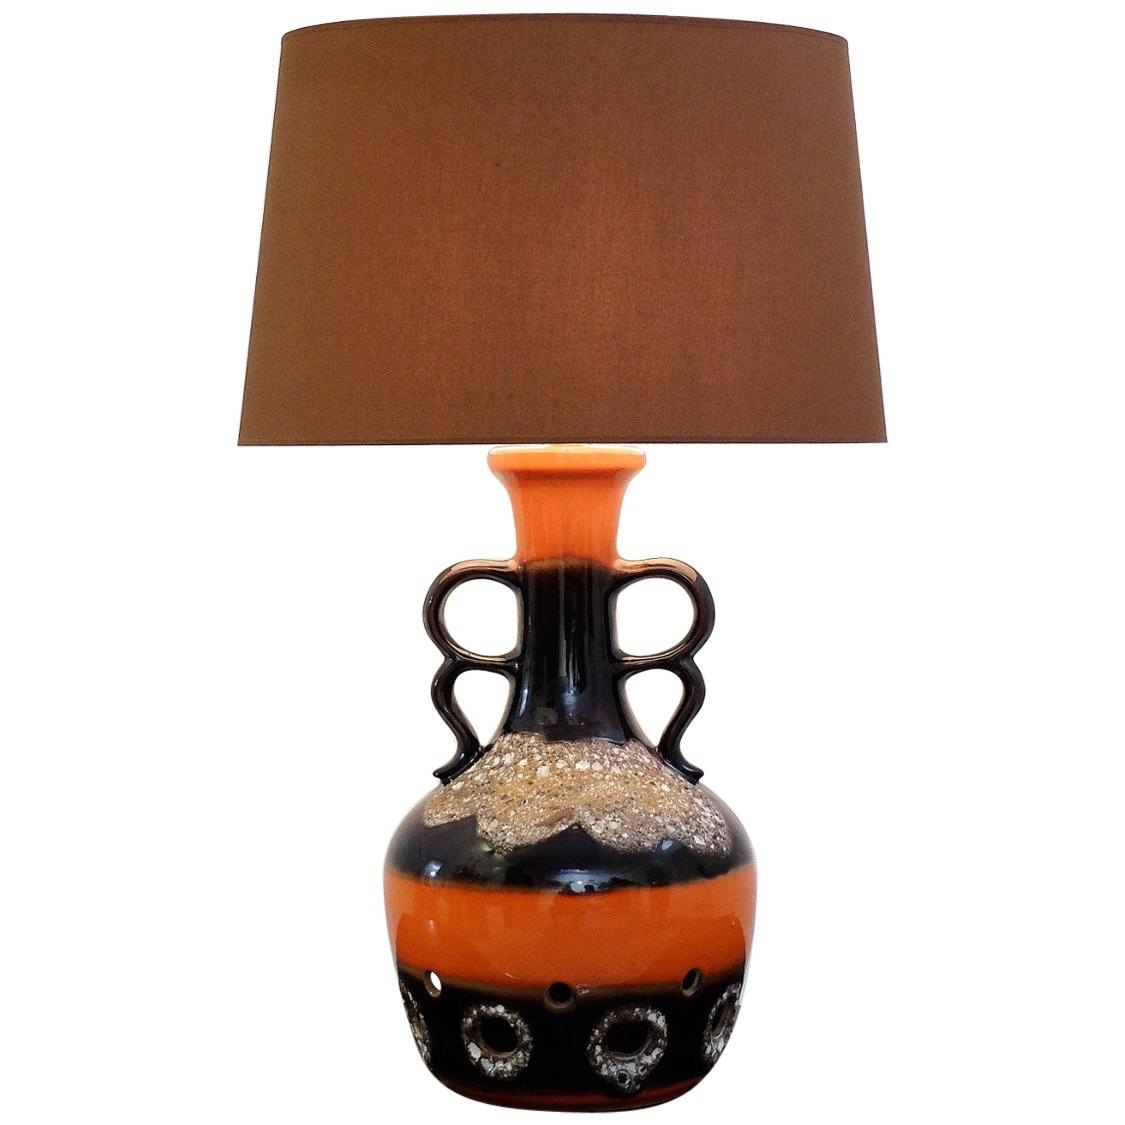 Fat Lava Orange and Brown Ceramic Table Lamp